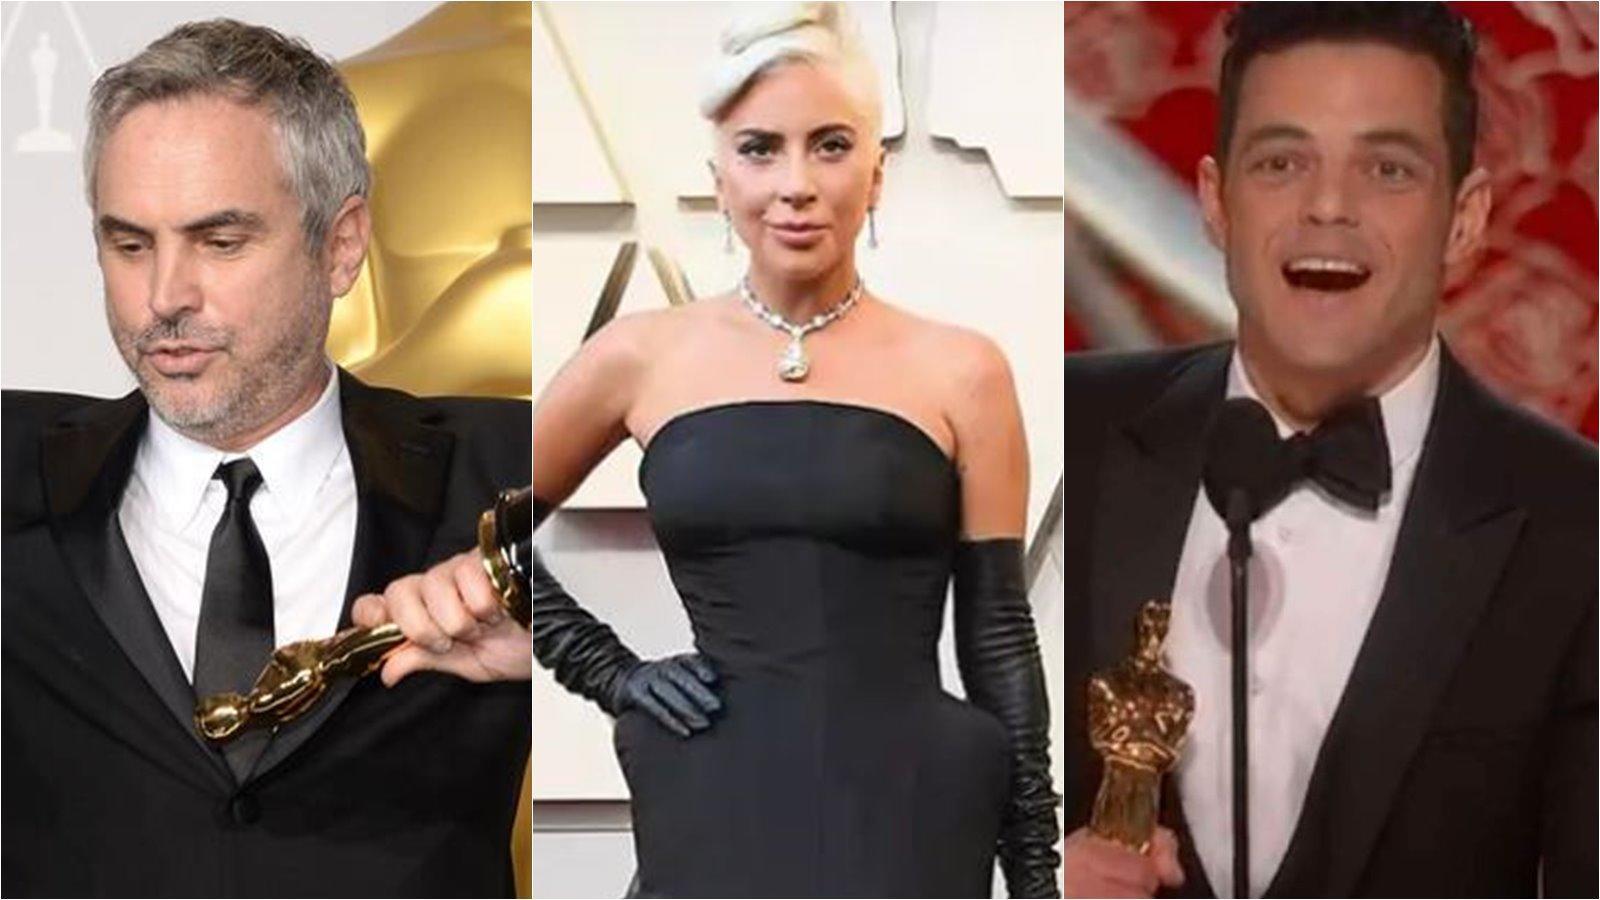 Oscars 2019: Rami Malek takes home Best Actor award, 'Green Book' bags Best Film